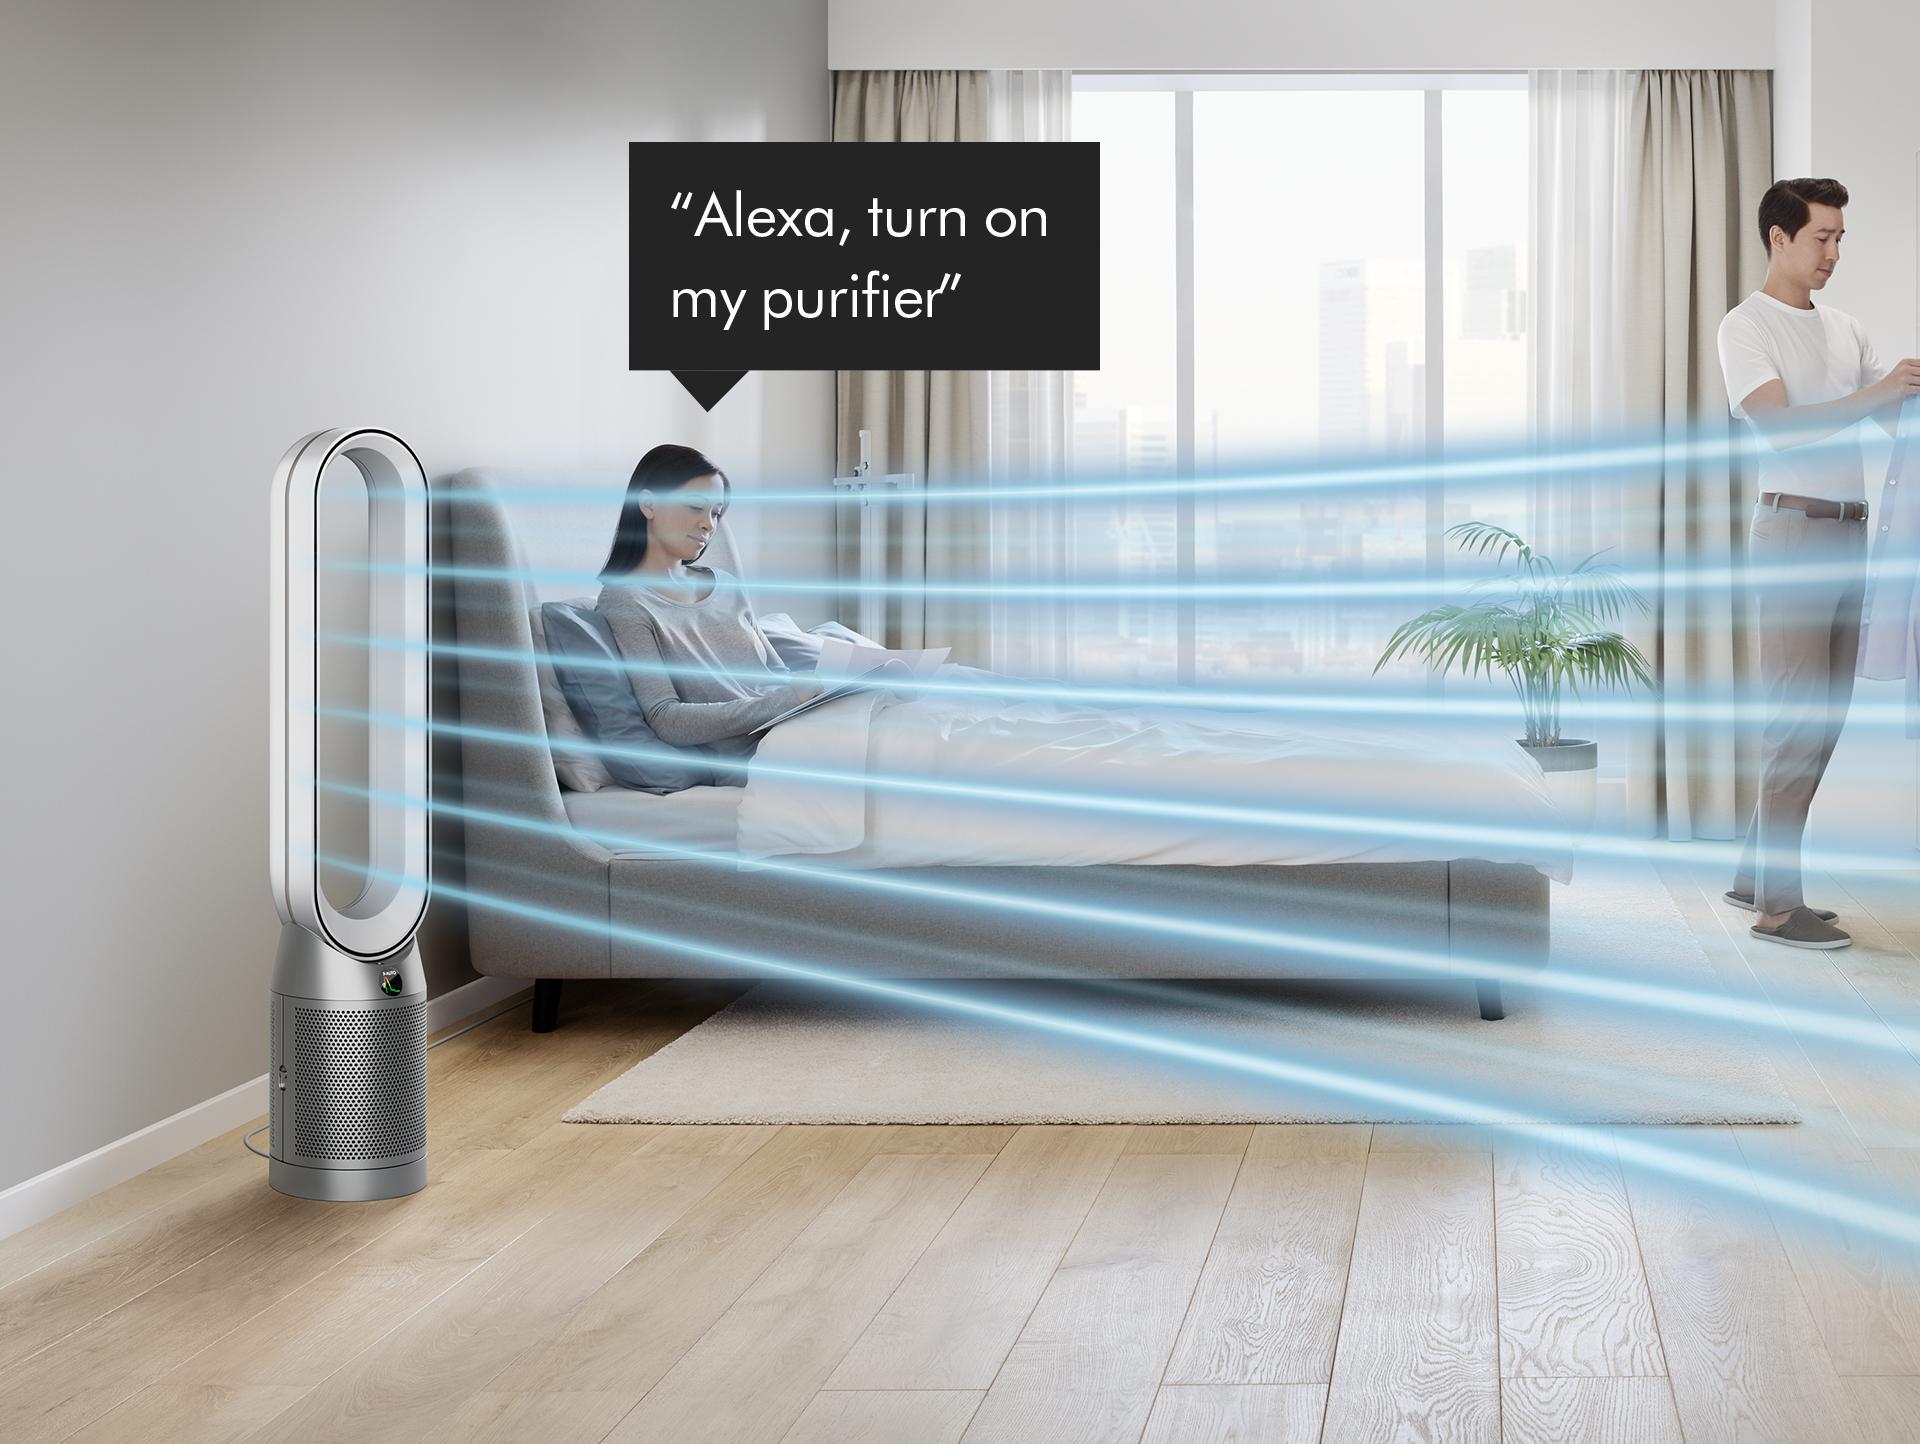 Woman asking Alexa to control her Dyson purifier